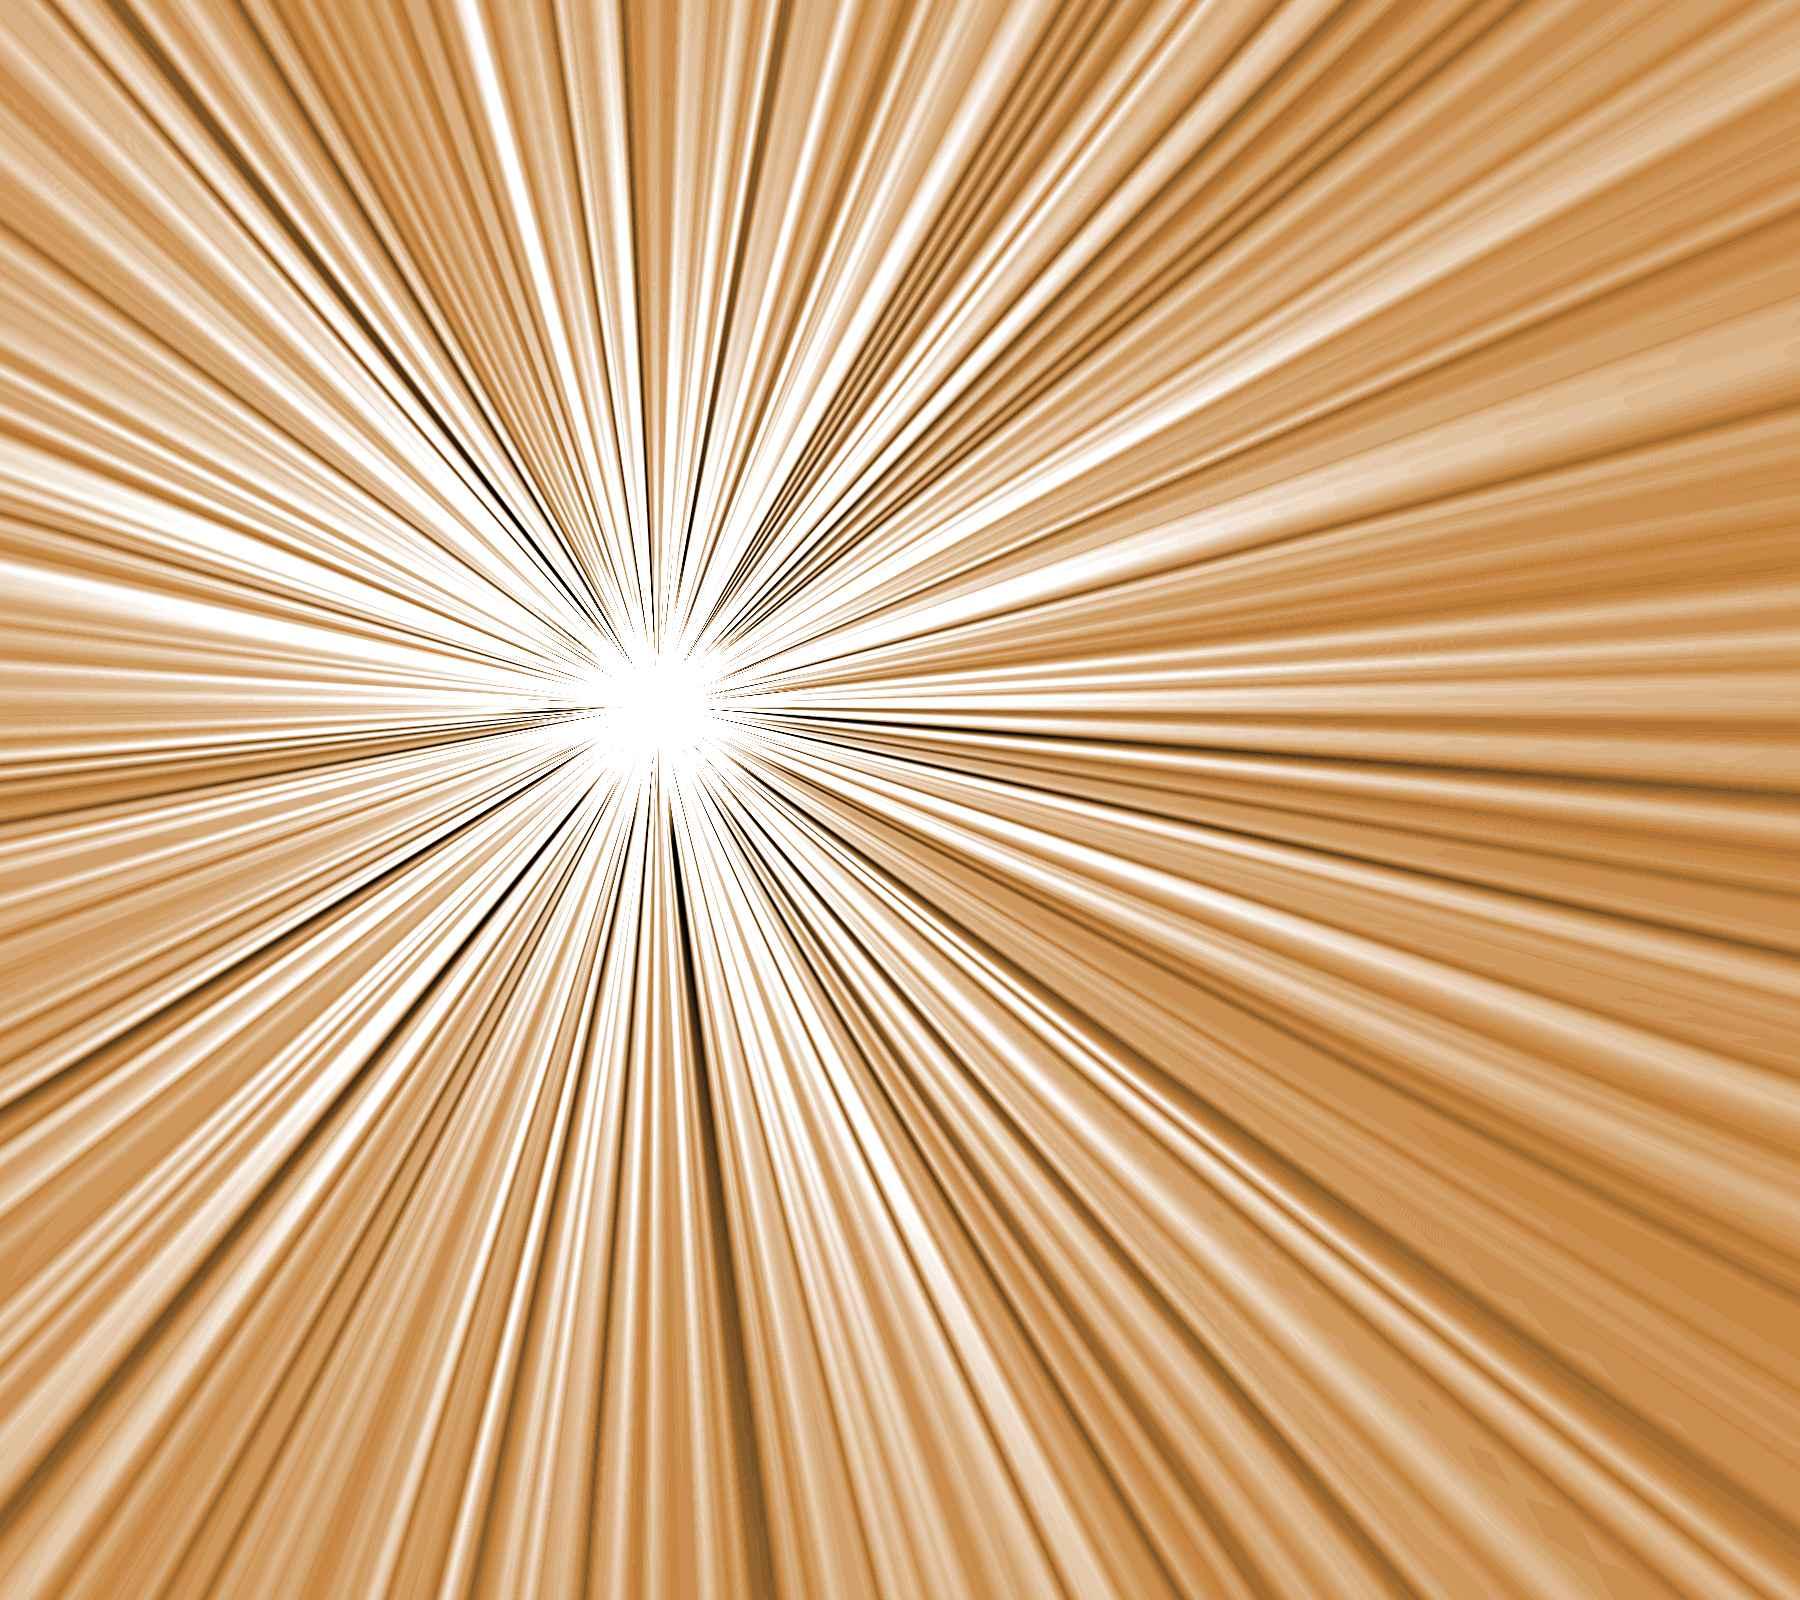 Brown Starburst Radiating Lines Background 1800x1600